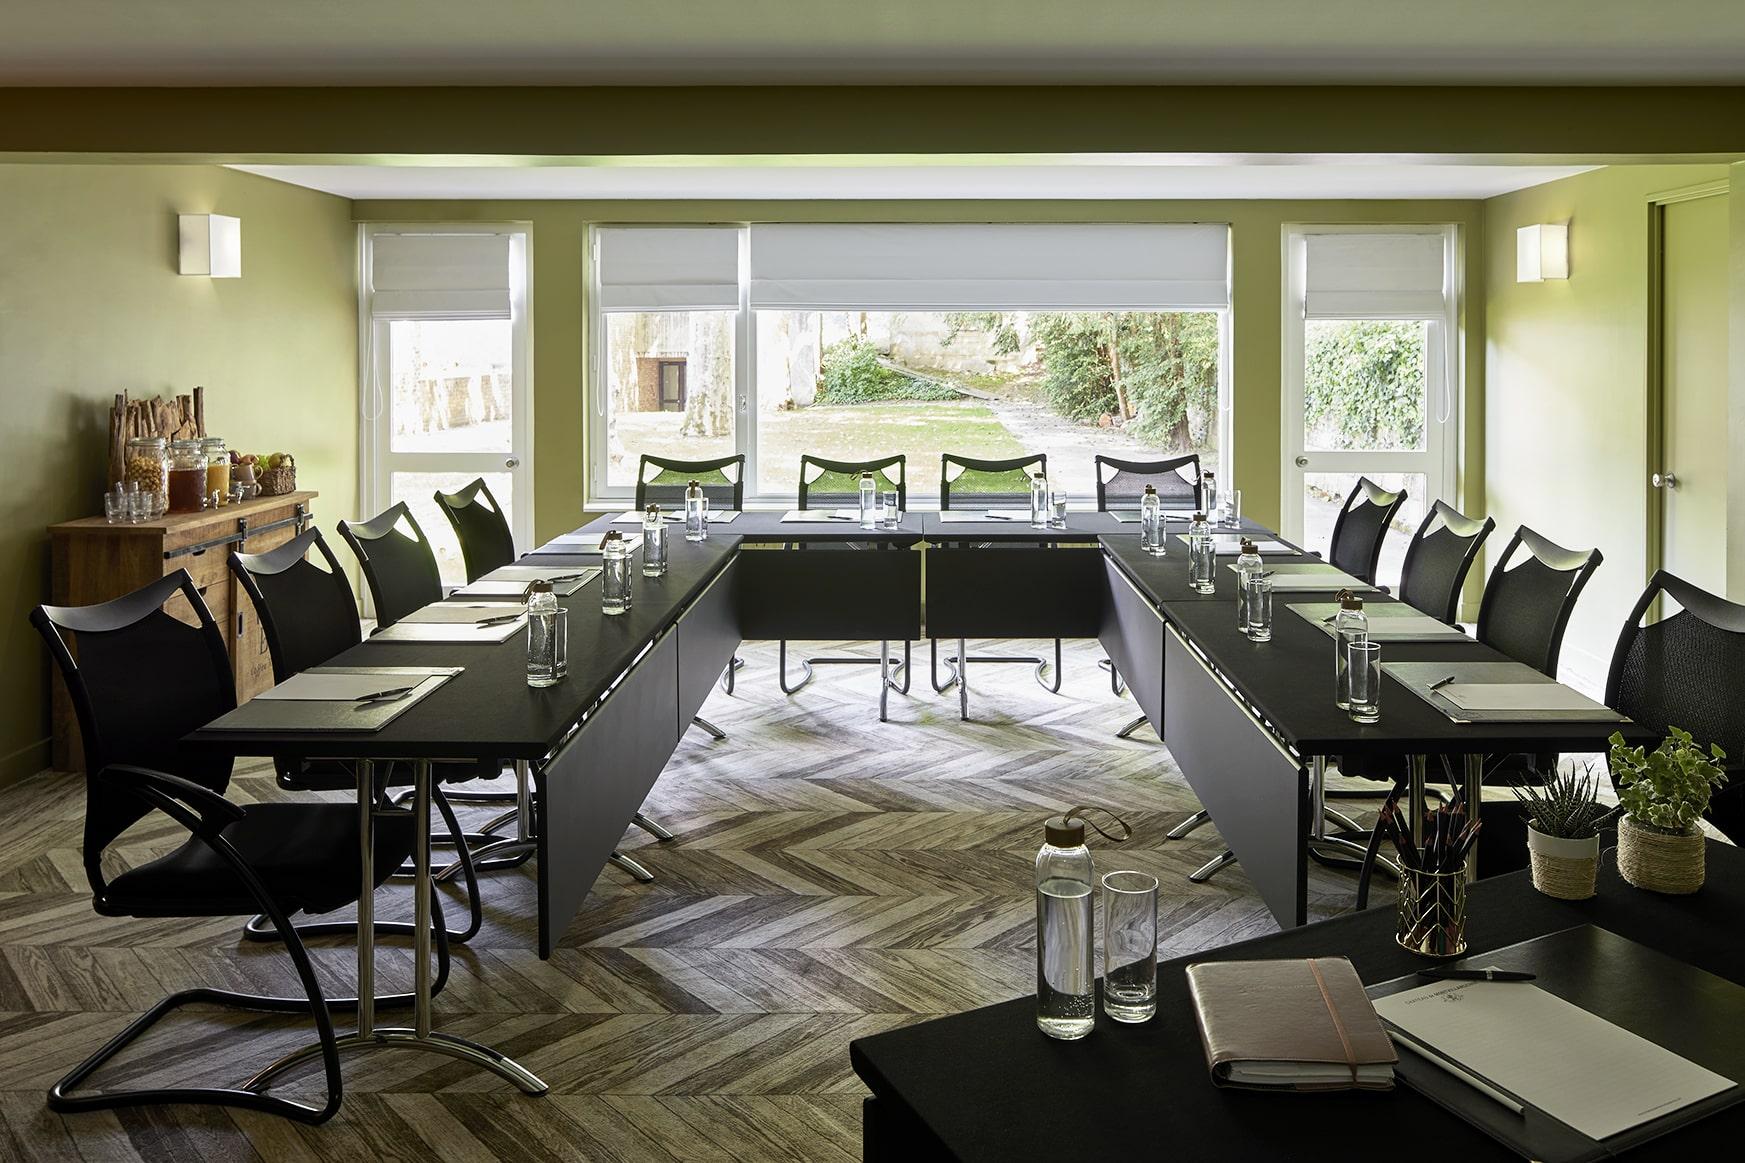 Verdi meeting room